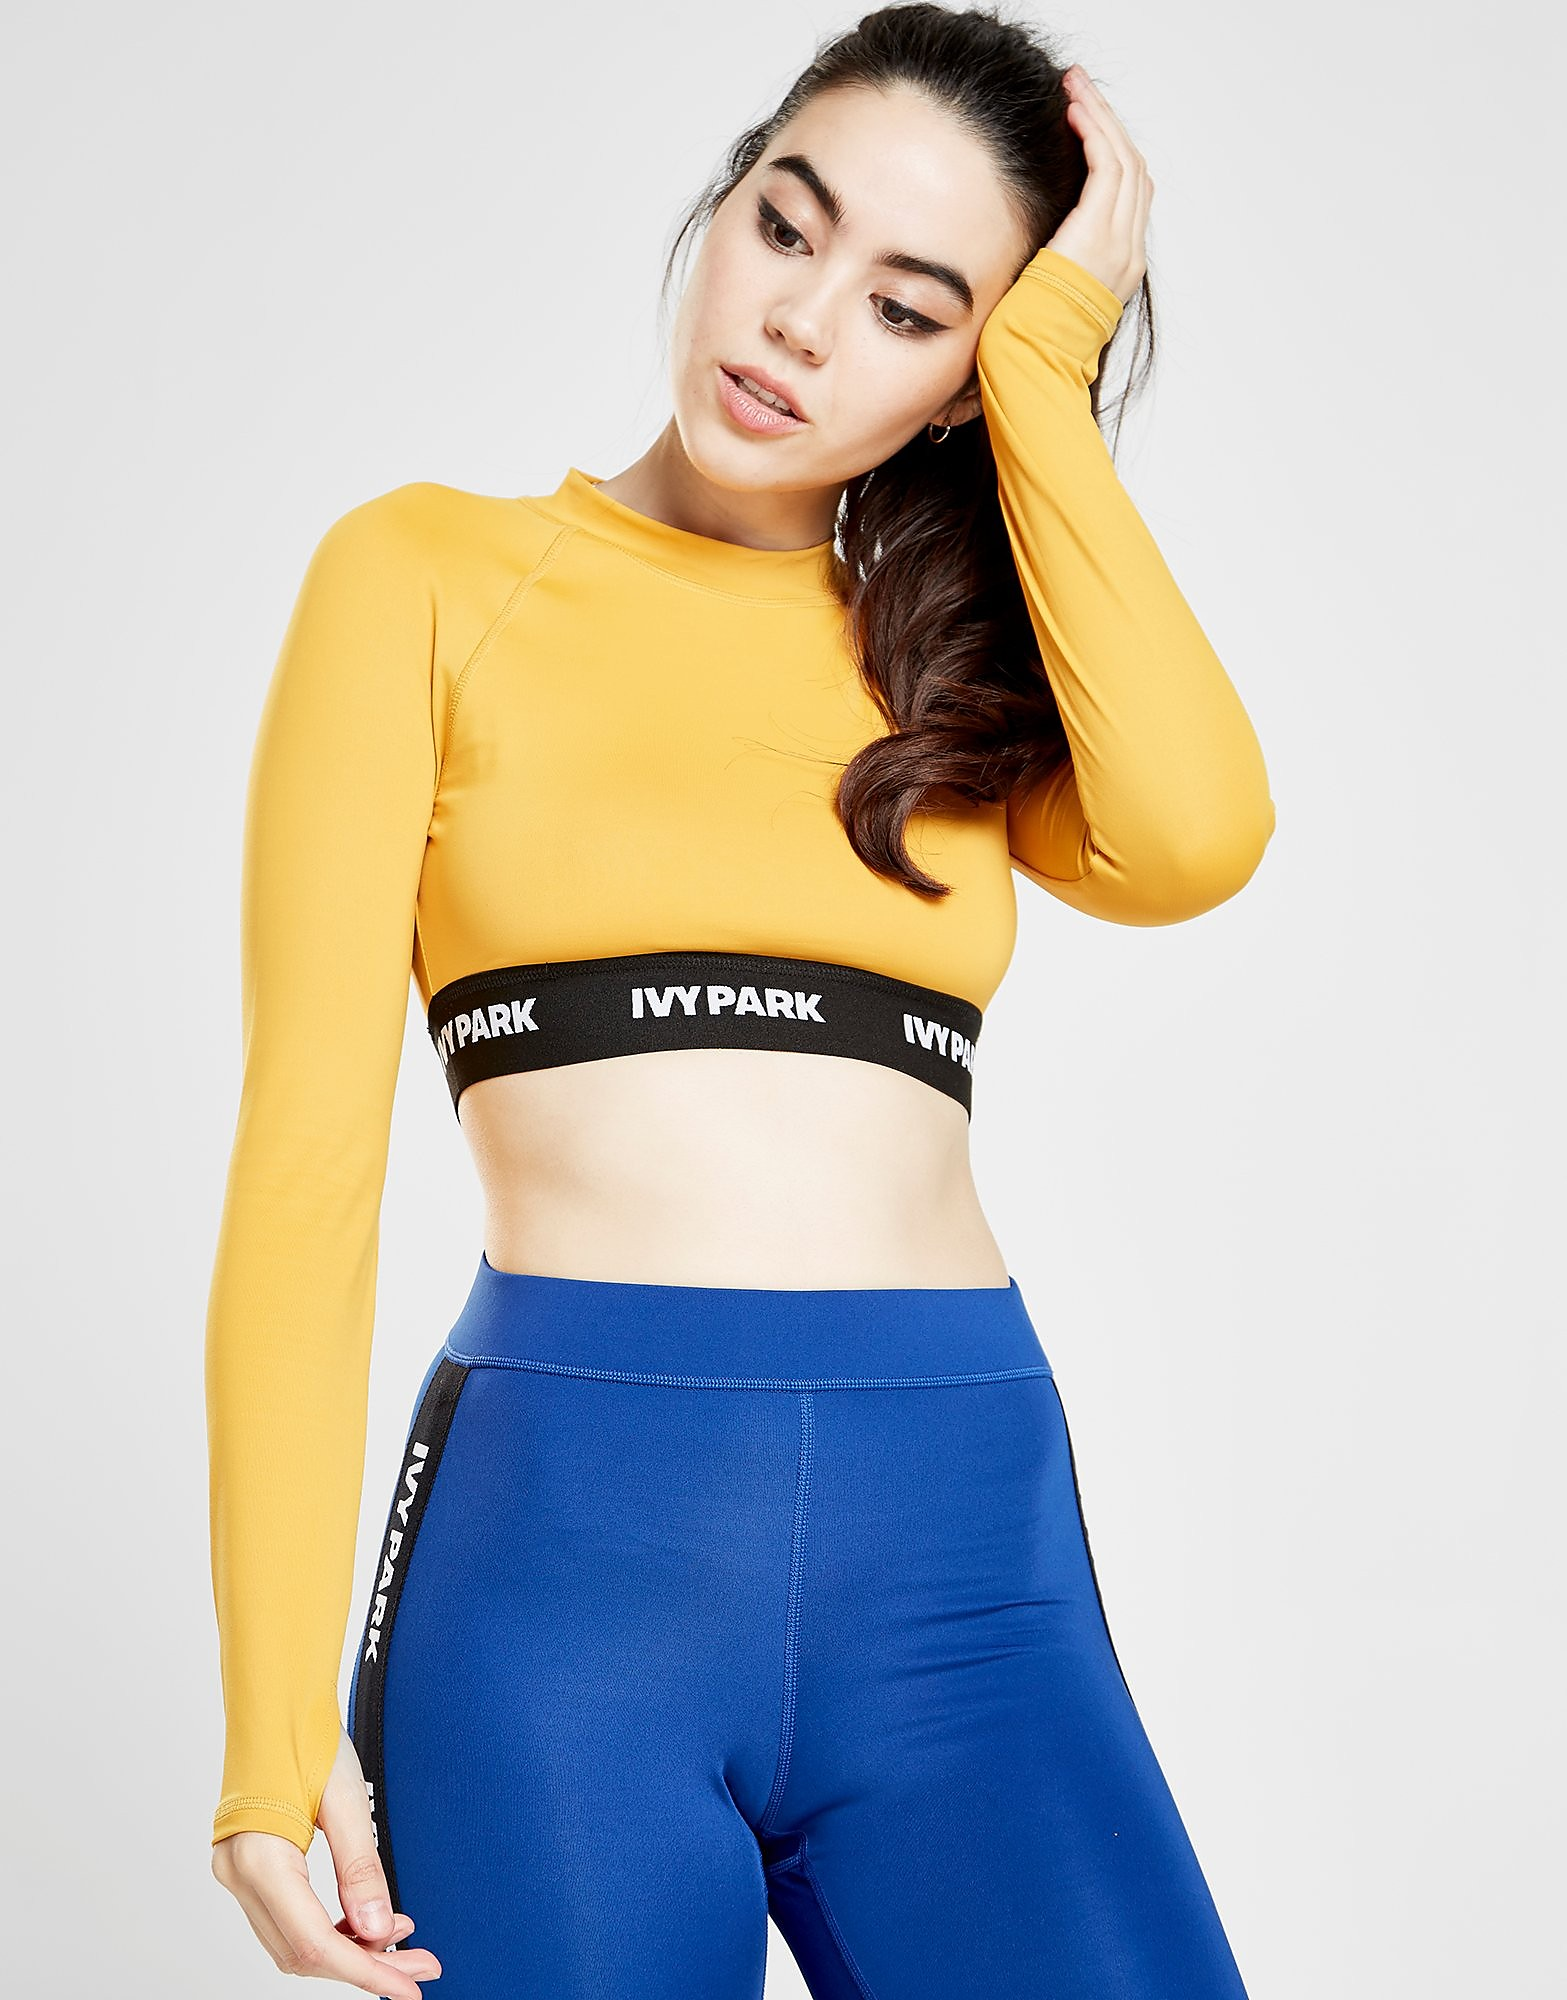 IVY PARK Tape Logo Long Sleeve Top Dames - Goud - Dames